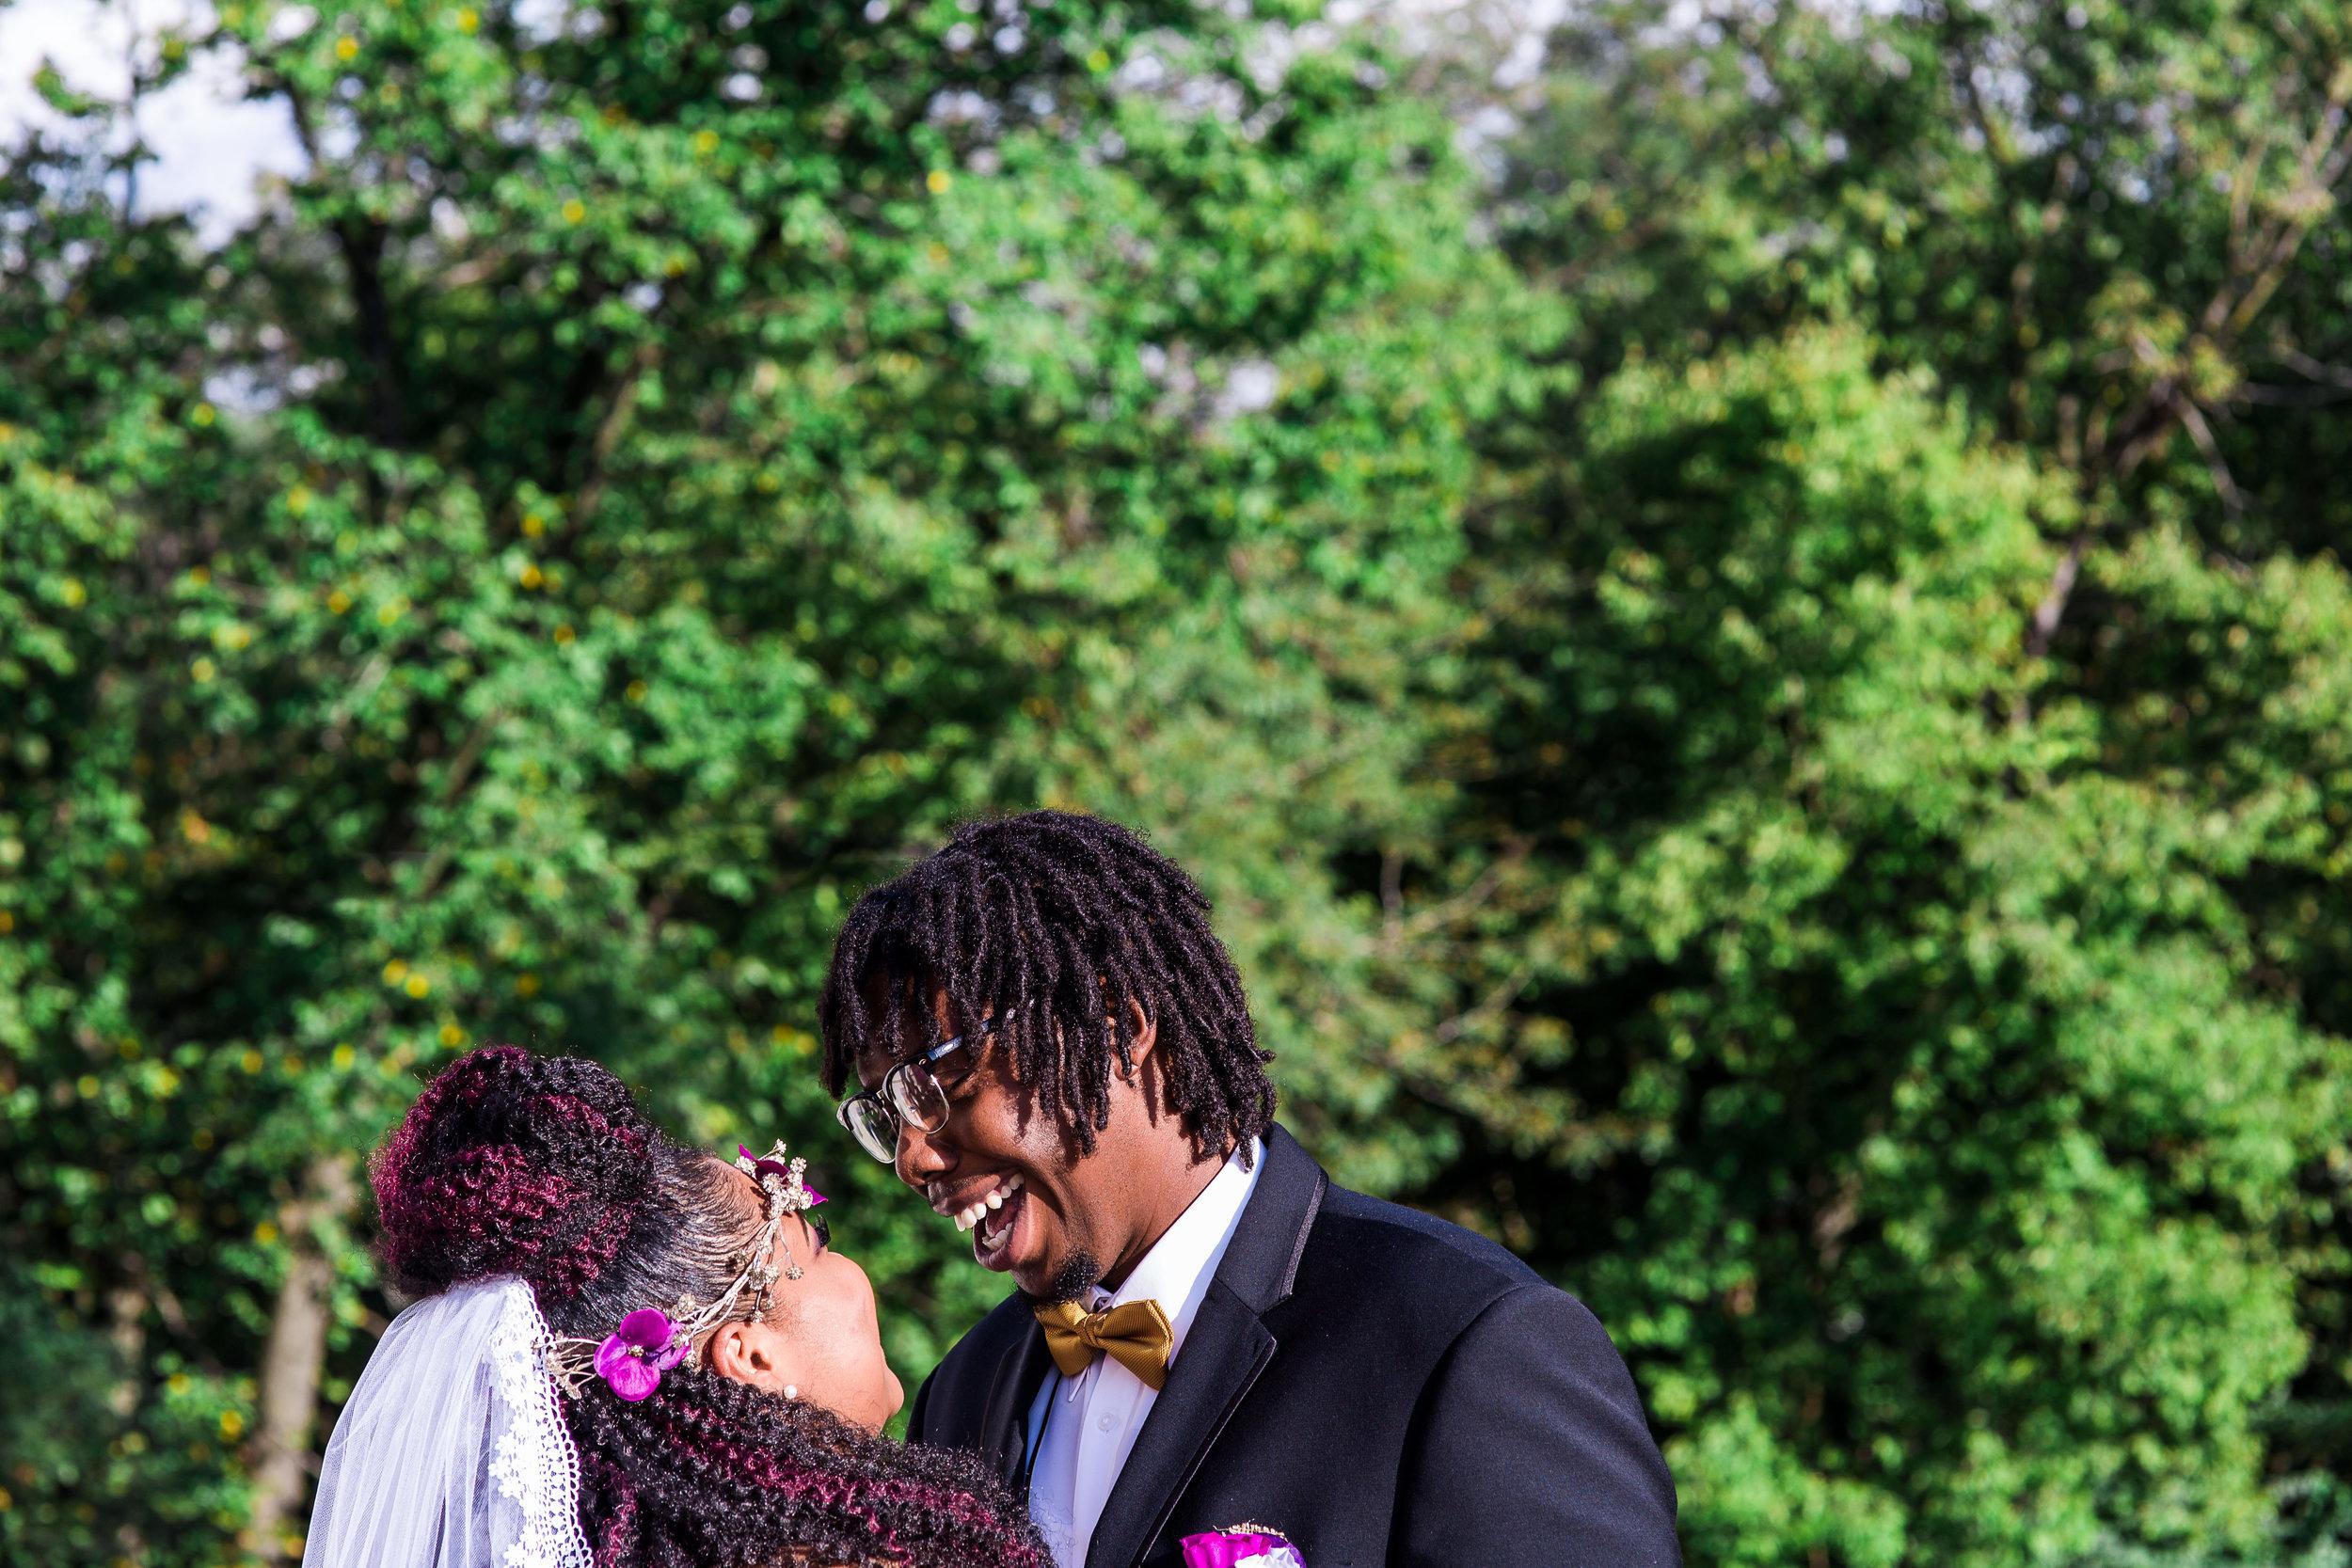 st-louis-wedding-photographer-the-bentleys-kansas-city-165.jpg